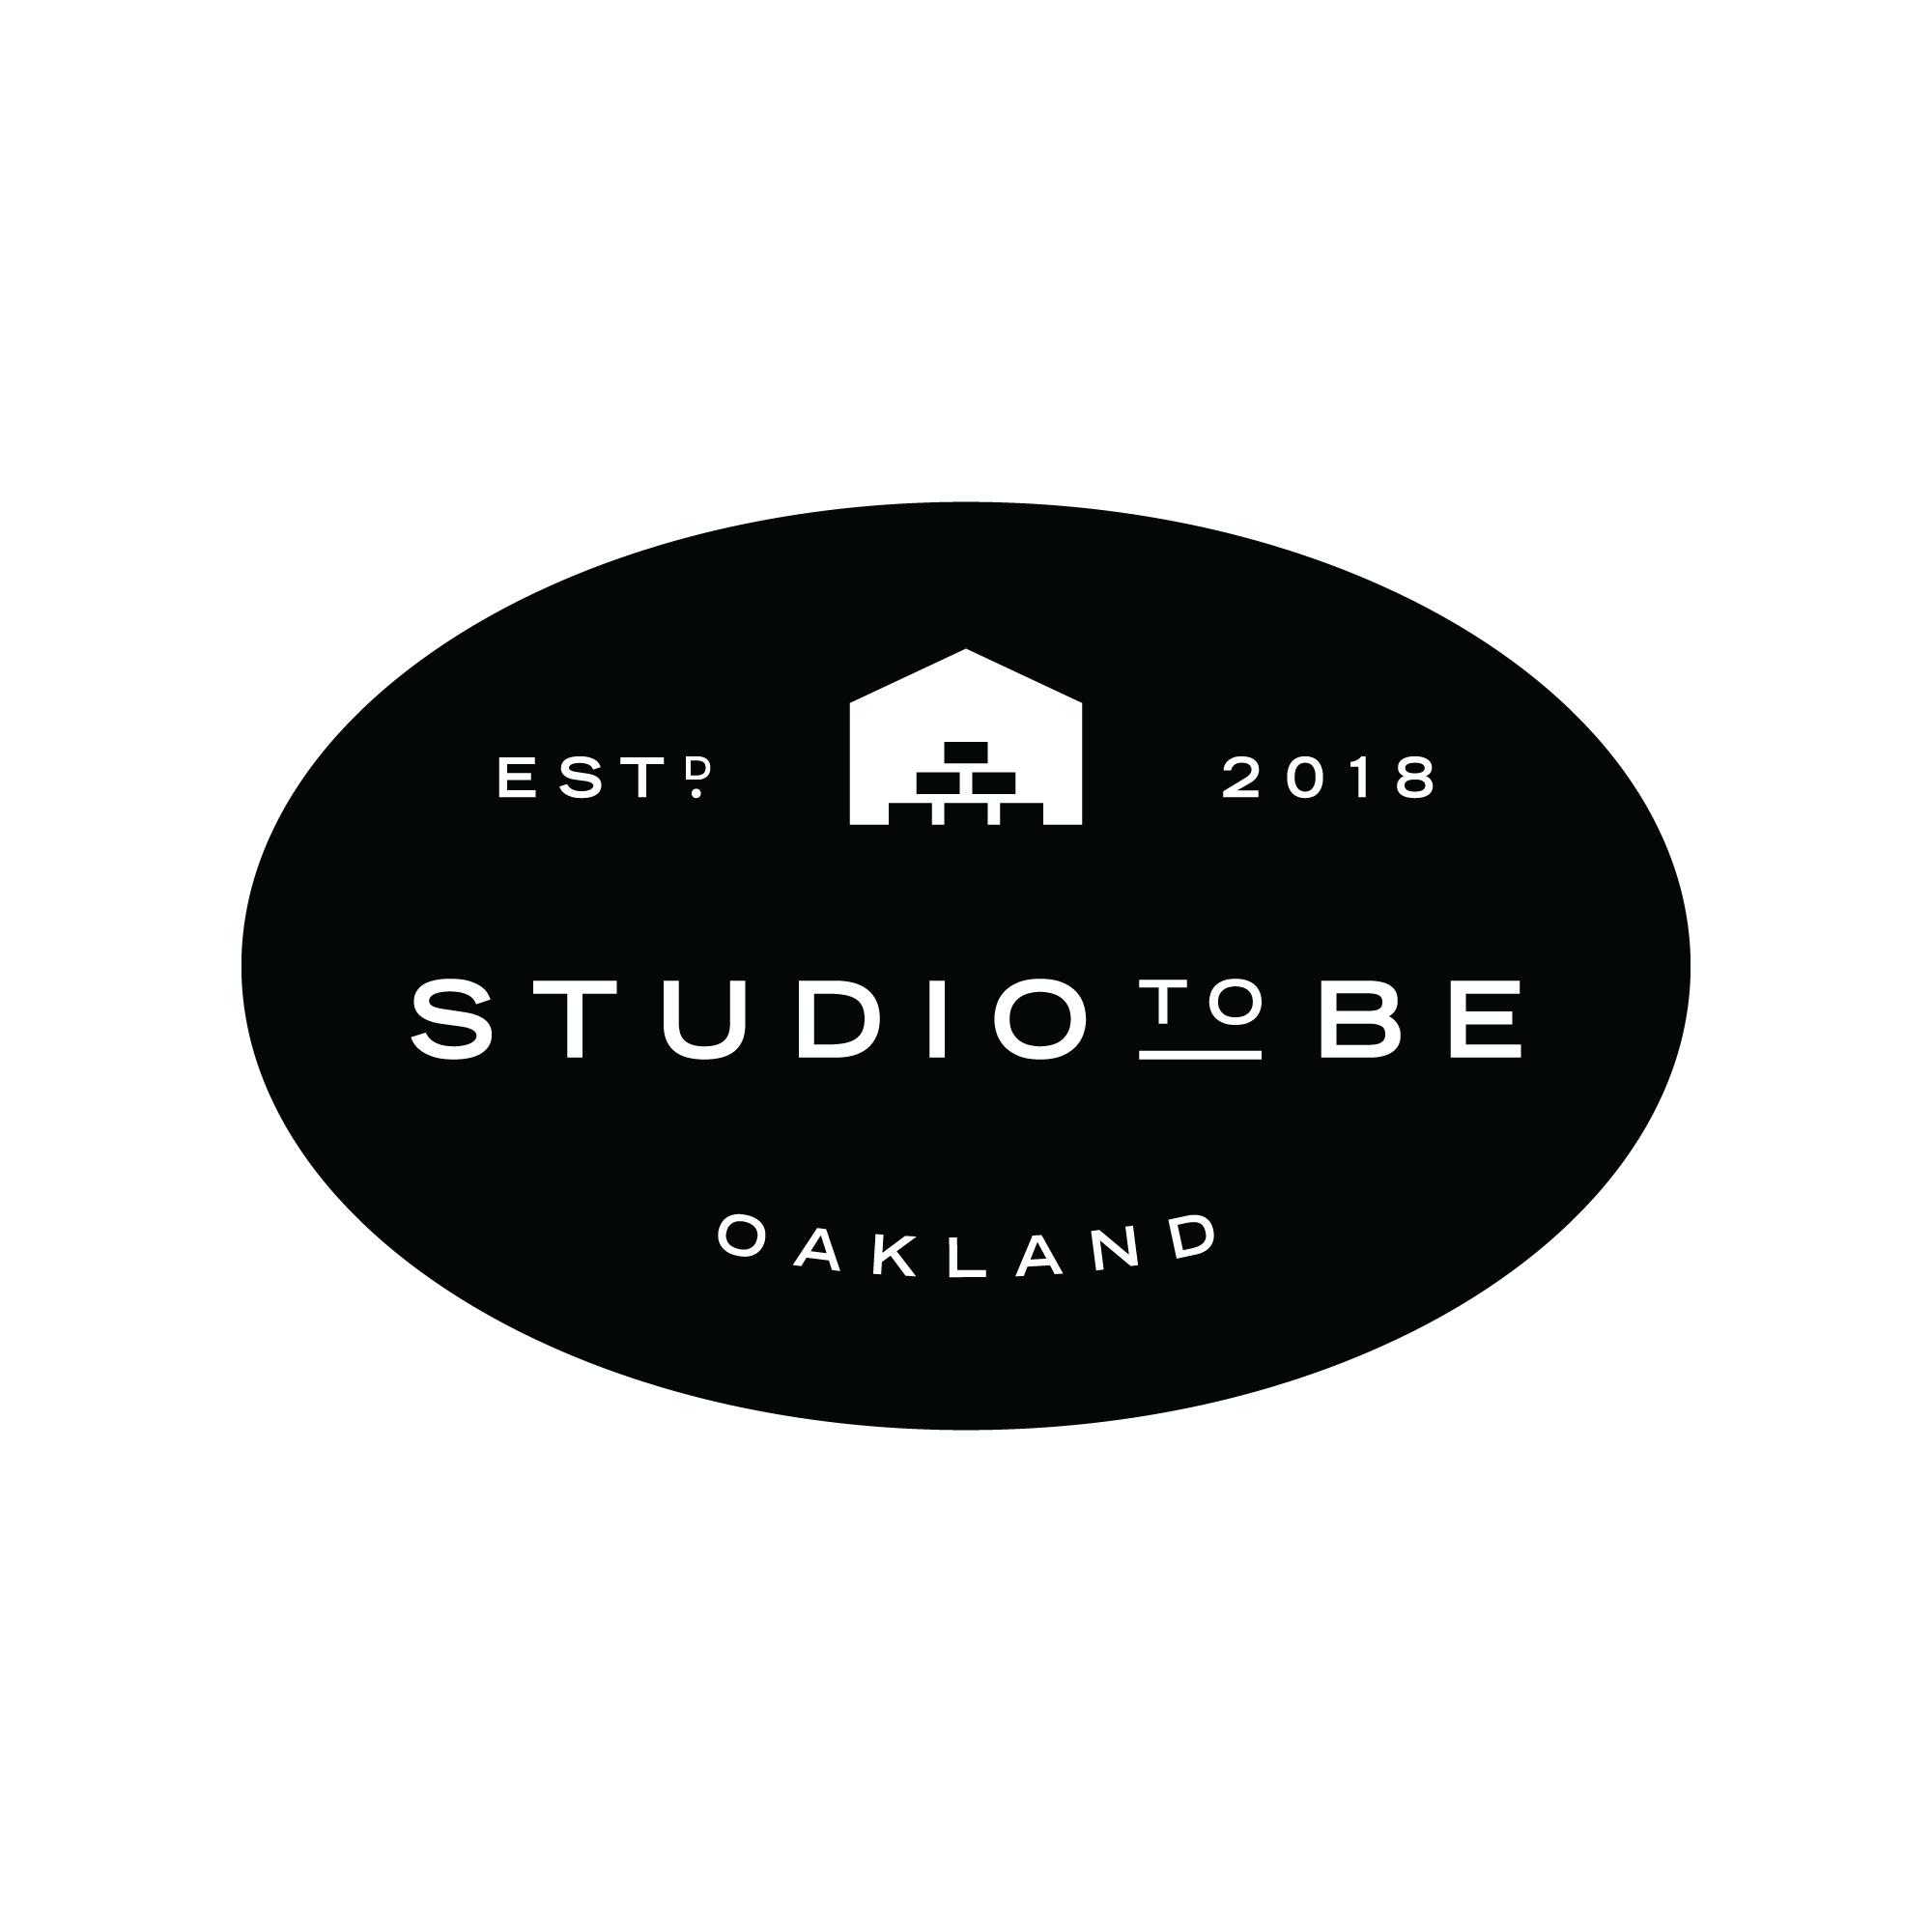 StudioToBe_shareable-seal.png